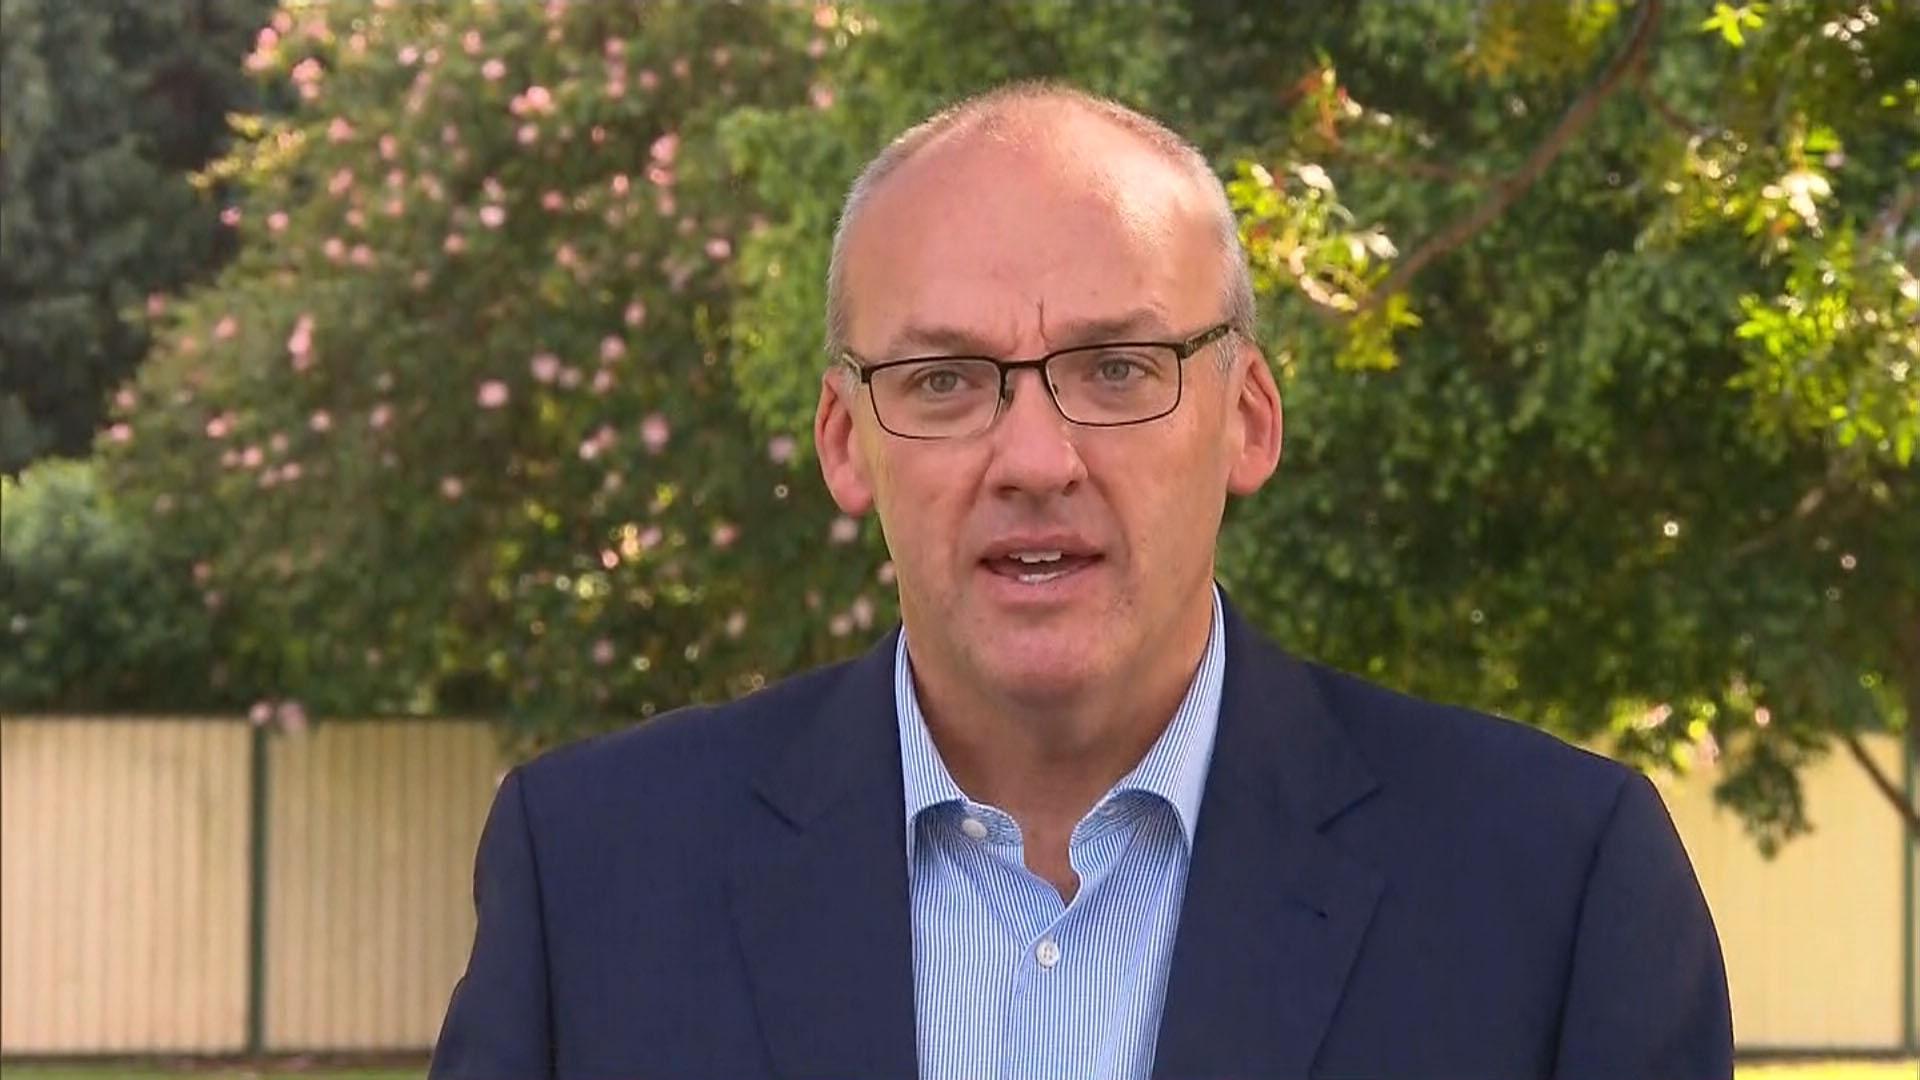 Luke Foley responds to harassment complaint against MP